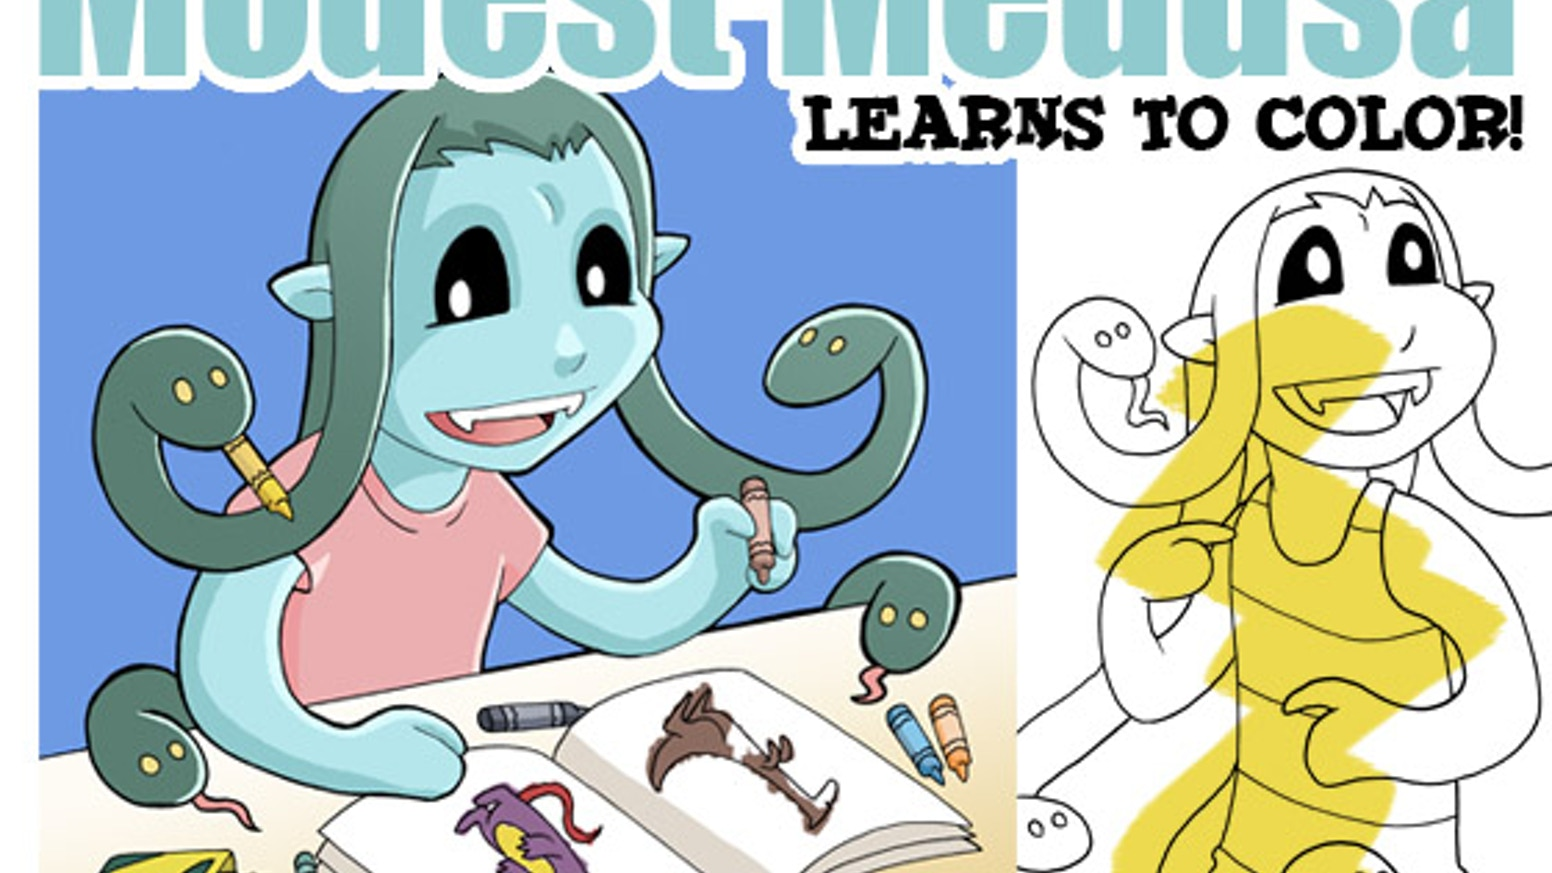 Modest Medusa Coloring Book! by Jake Richmond — Kickstarter